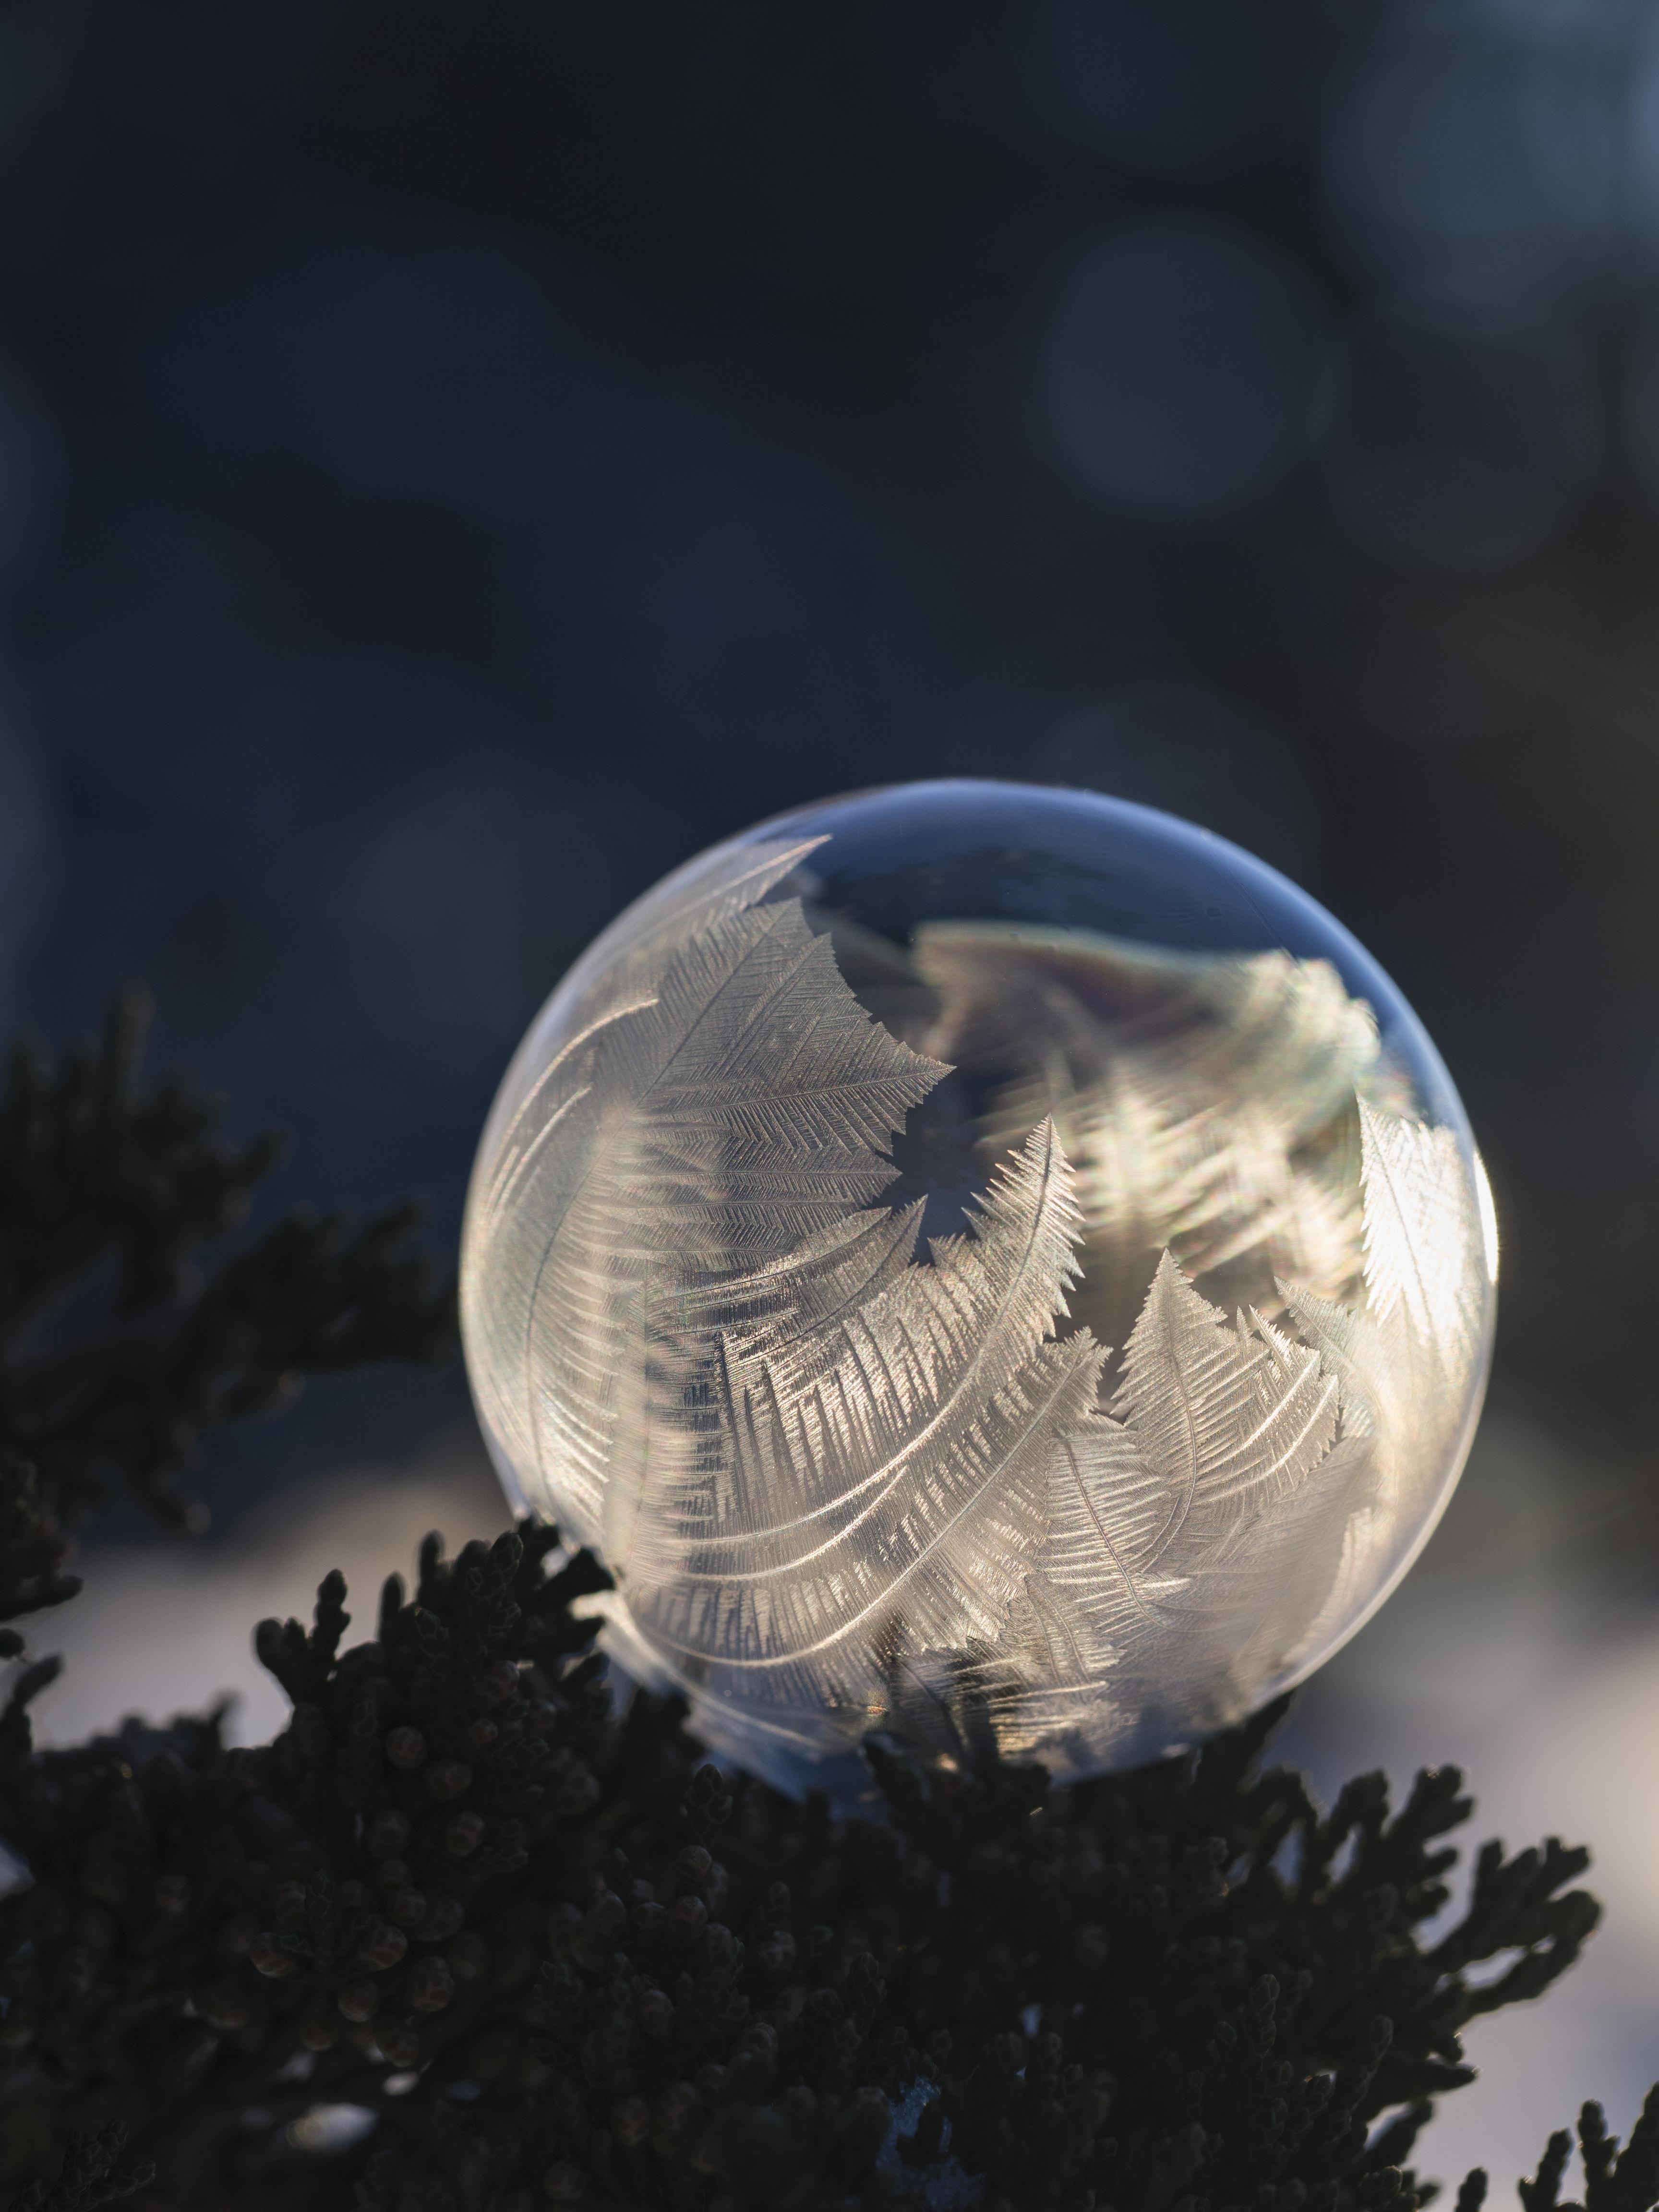 closeup photography of glass ball